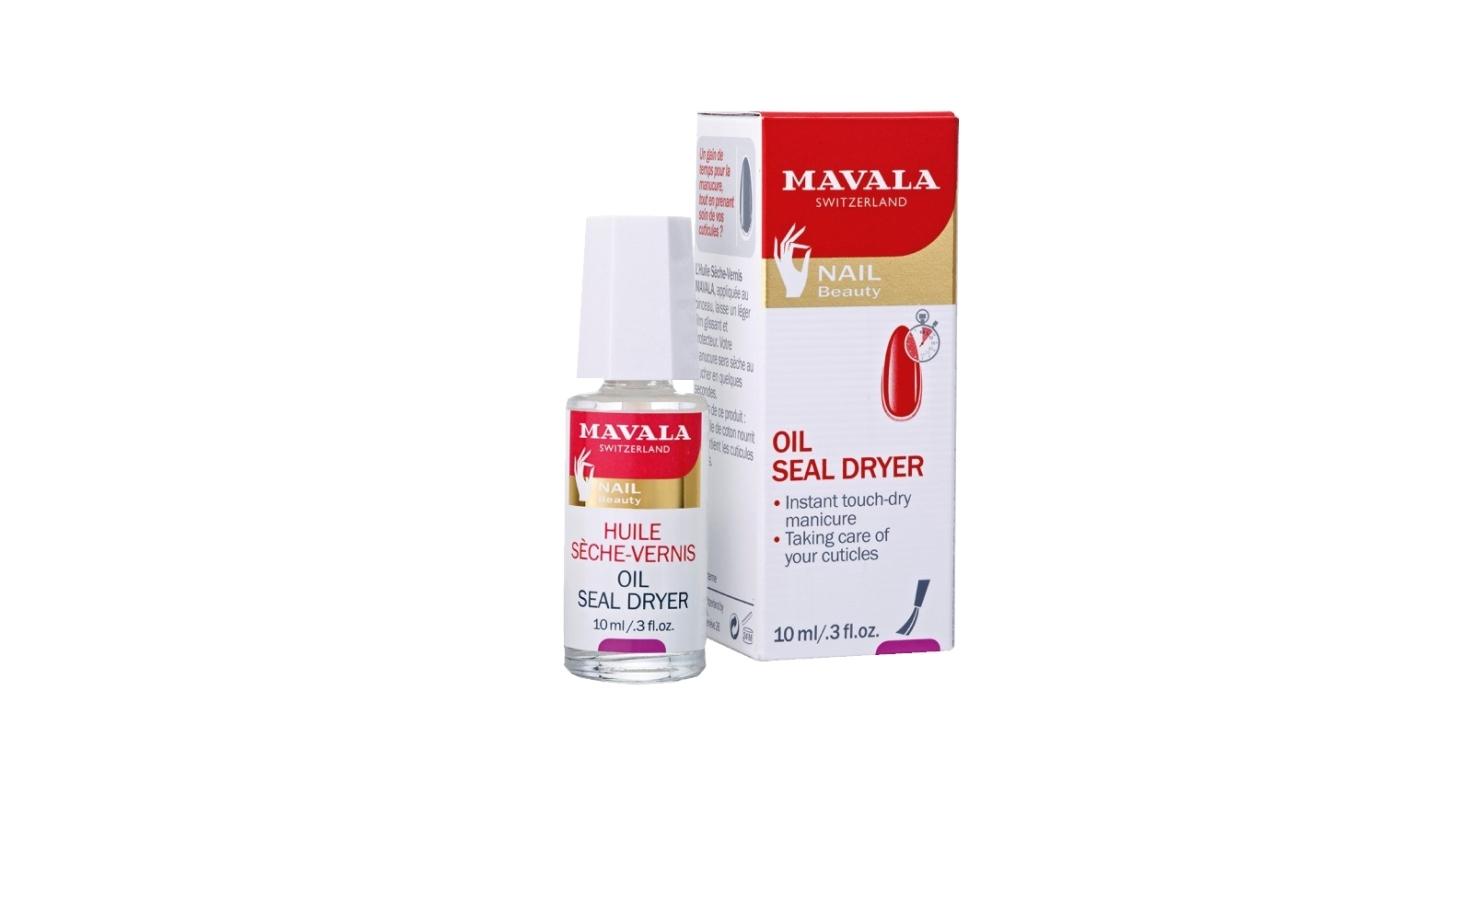 Mavala Seal Dryer Nagellack